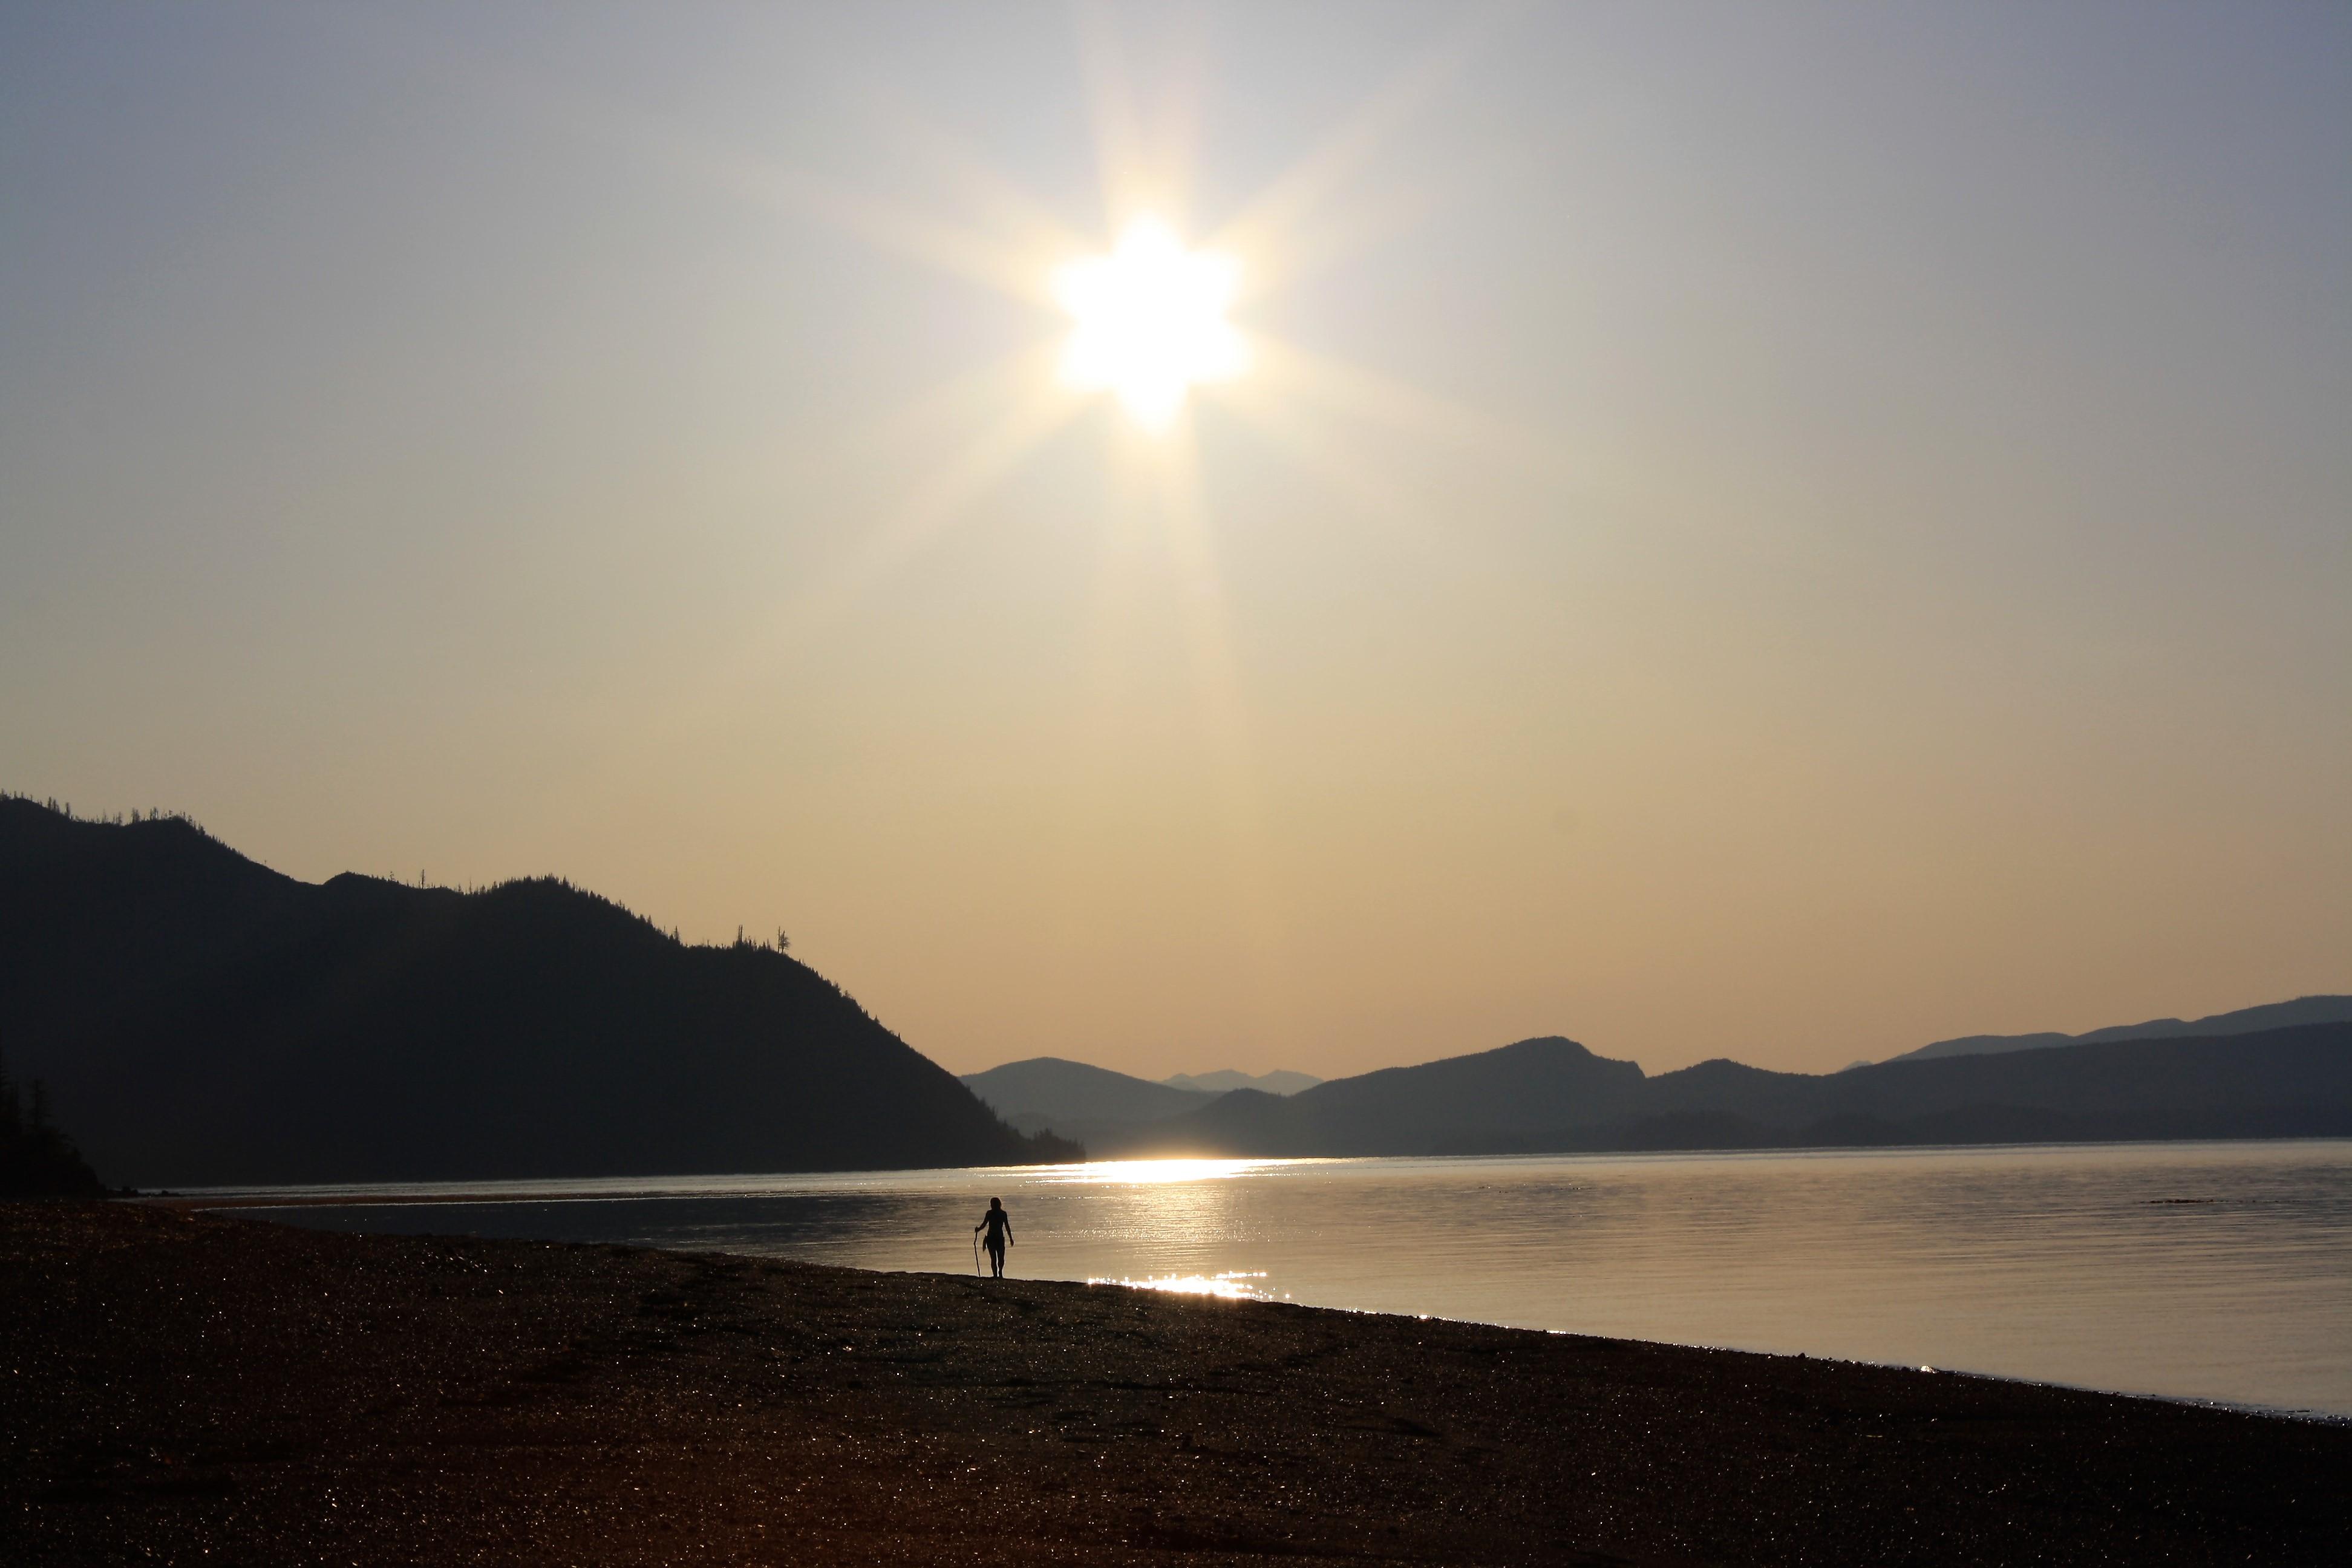 DM_nature_sunsetssunrises_haidagwaii_533